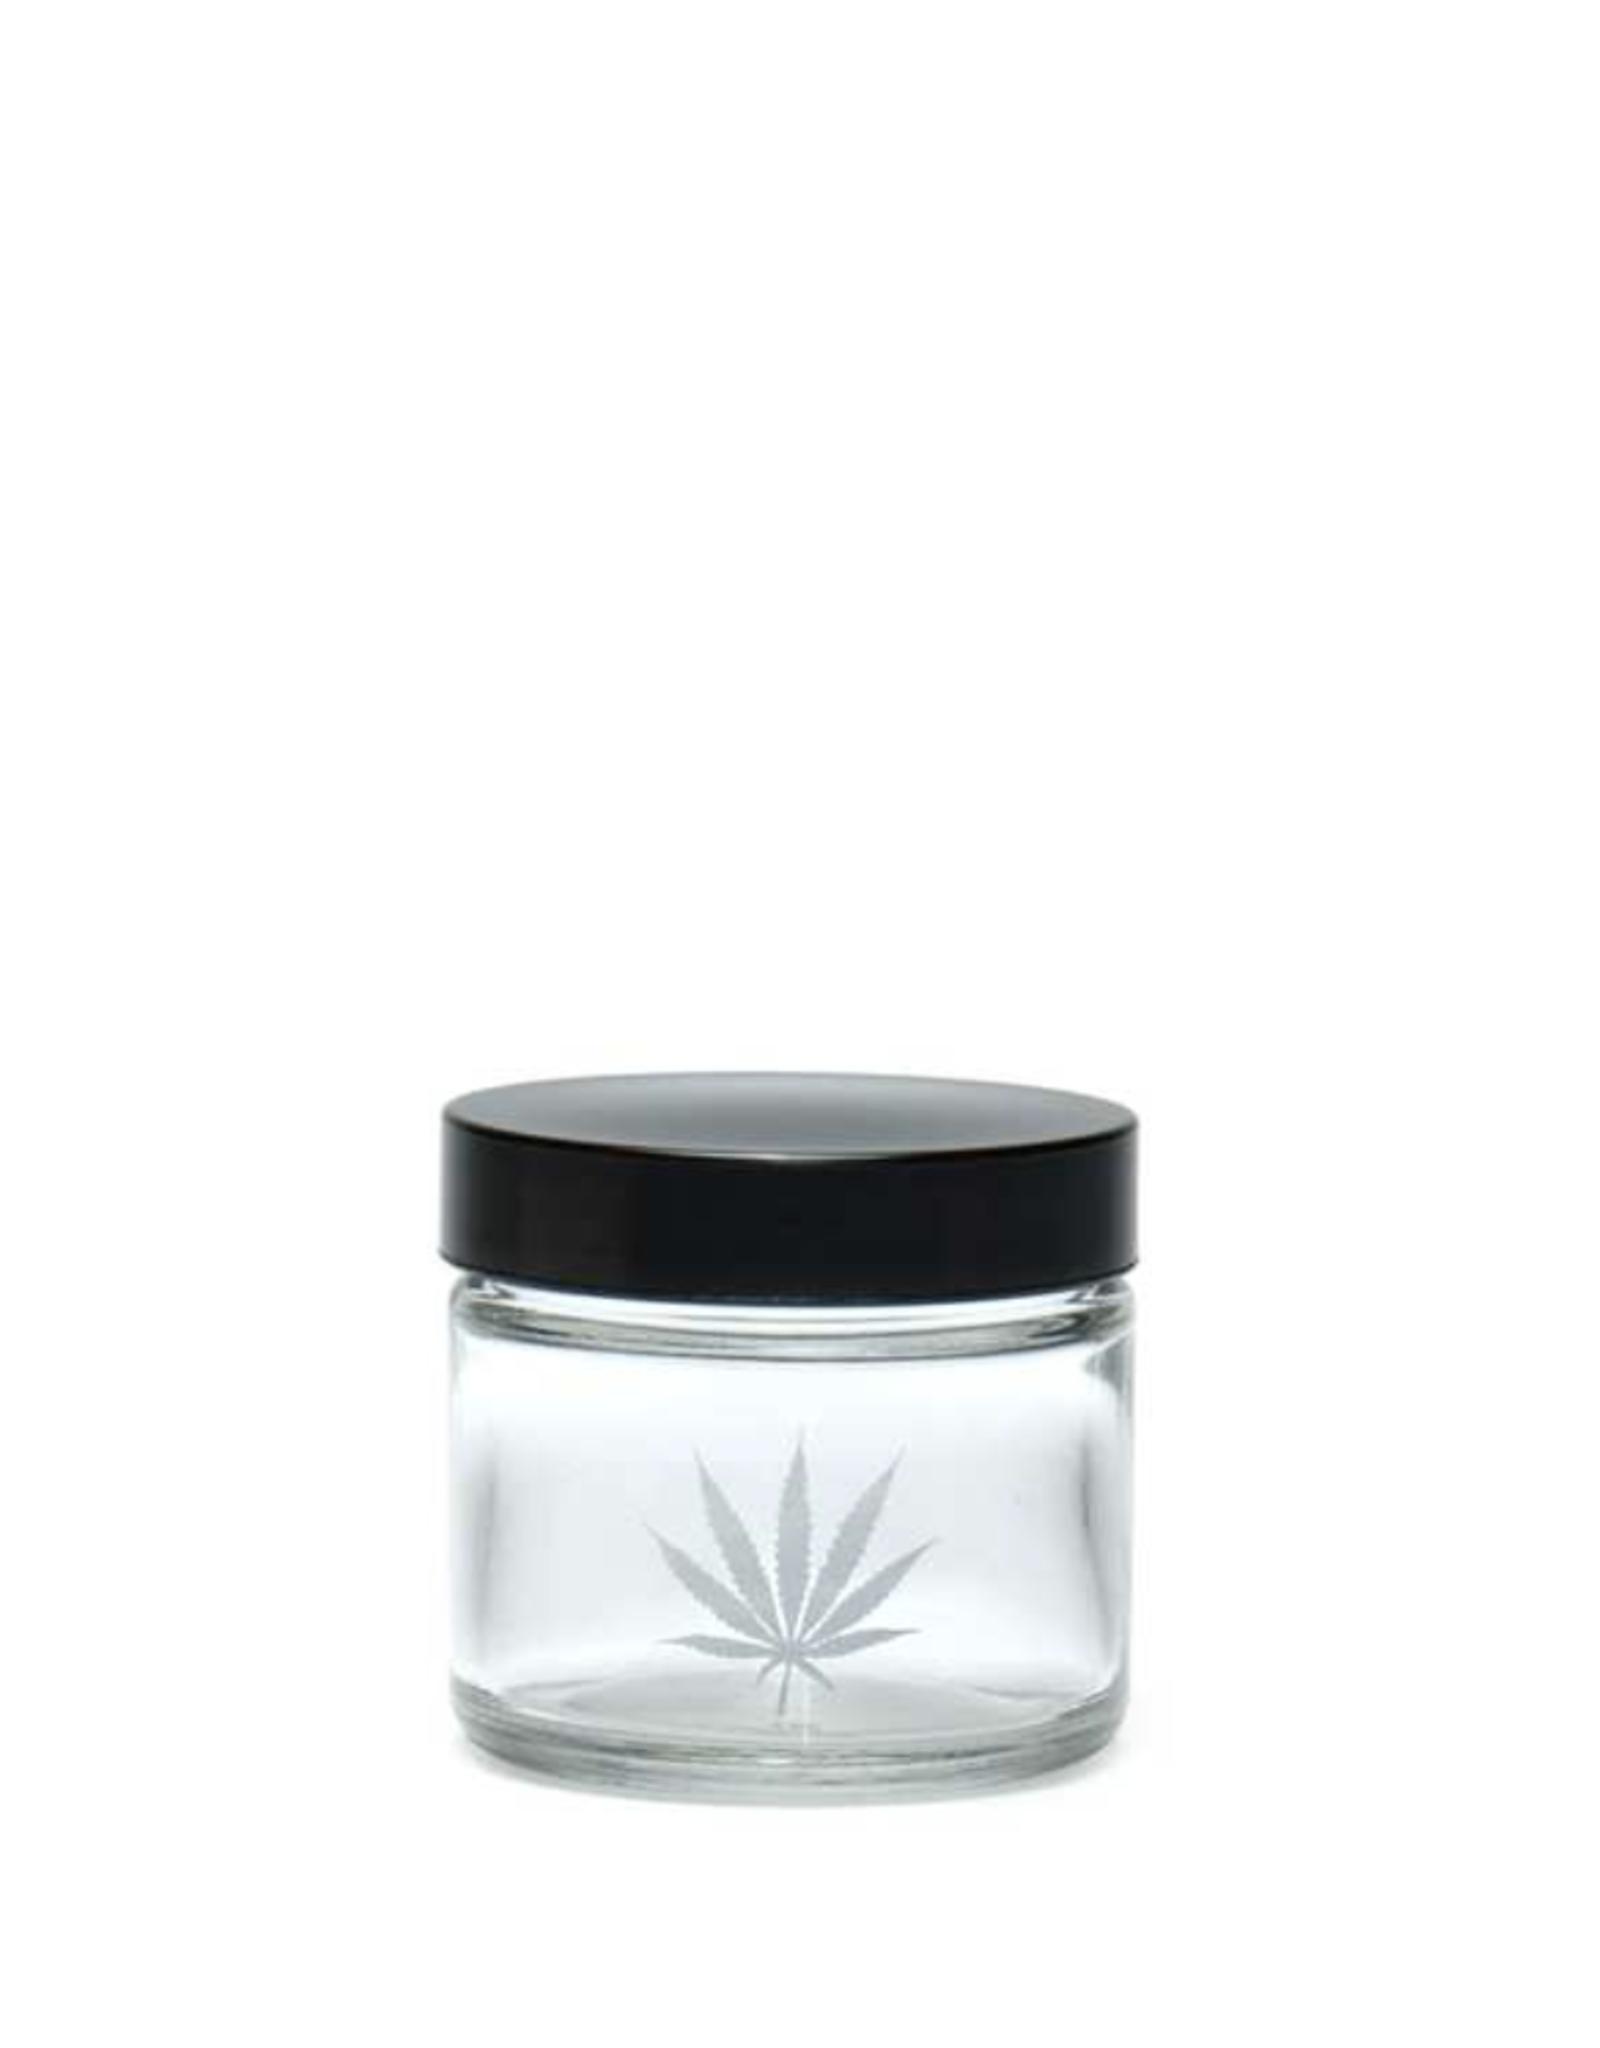 420 Science Clear Screw Top Jar Small - Silver Leaf